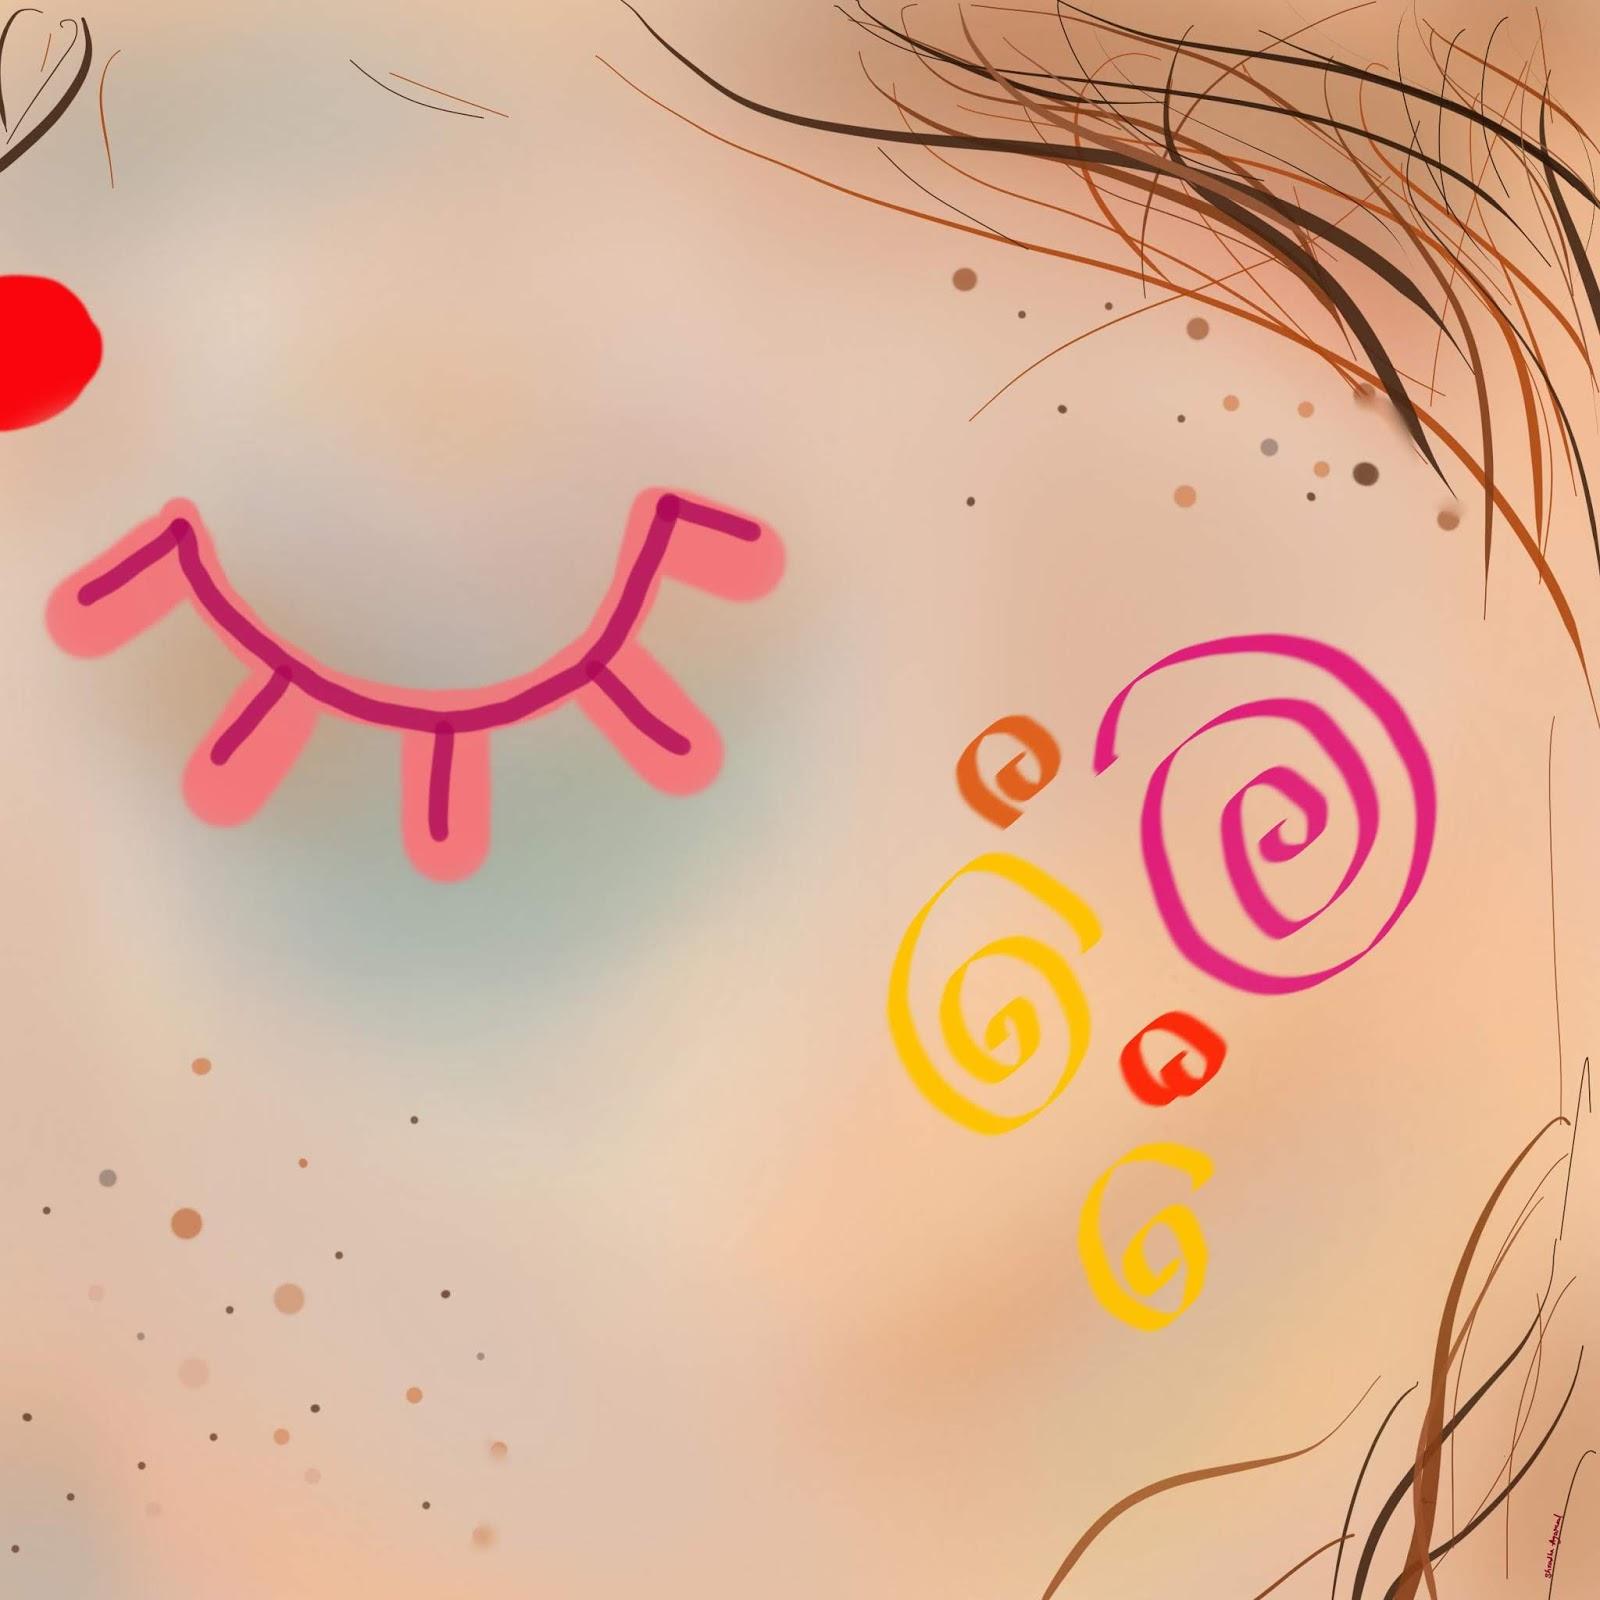 My First Digital Art Using Autodesk Sketchbook Ideas And